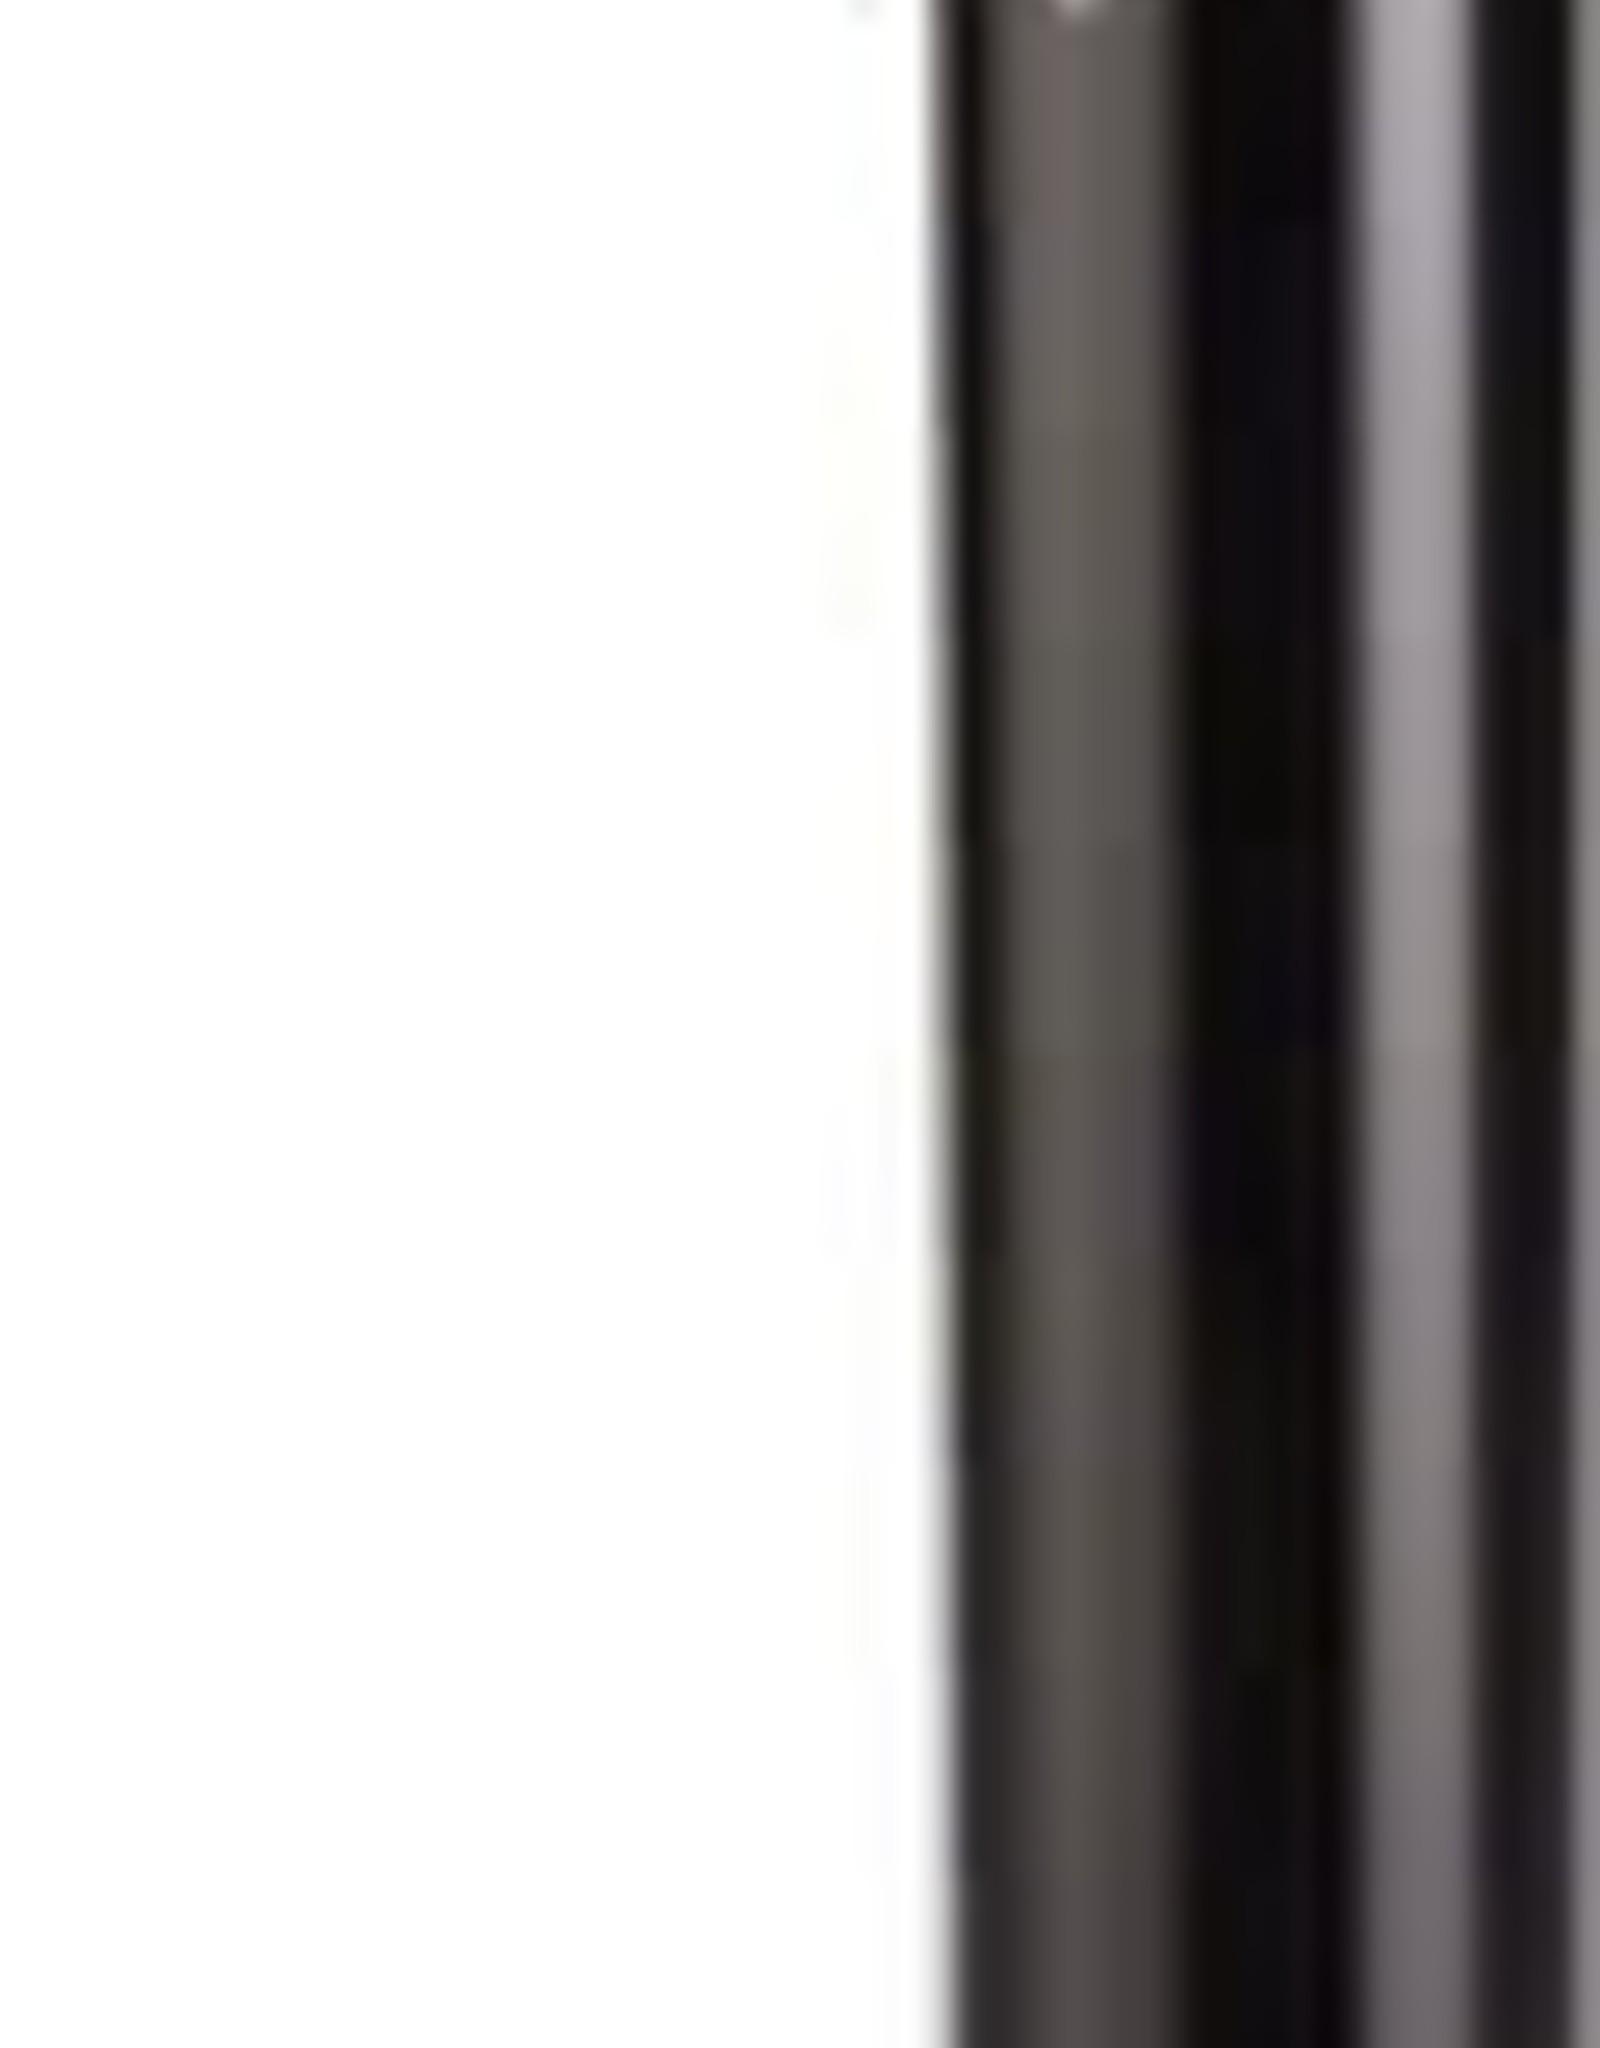 Kalloy Uno 602 Seatpost, 31.6 x 350mm, Black